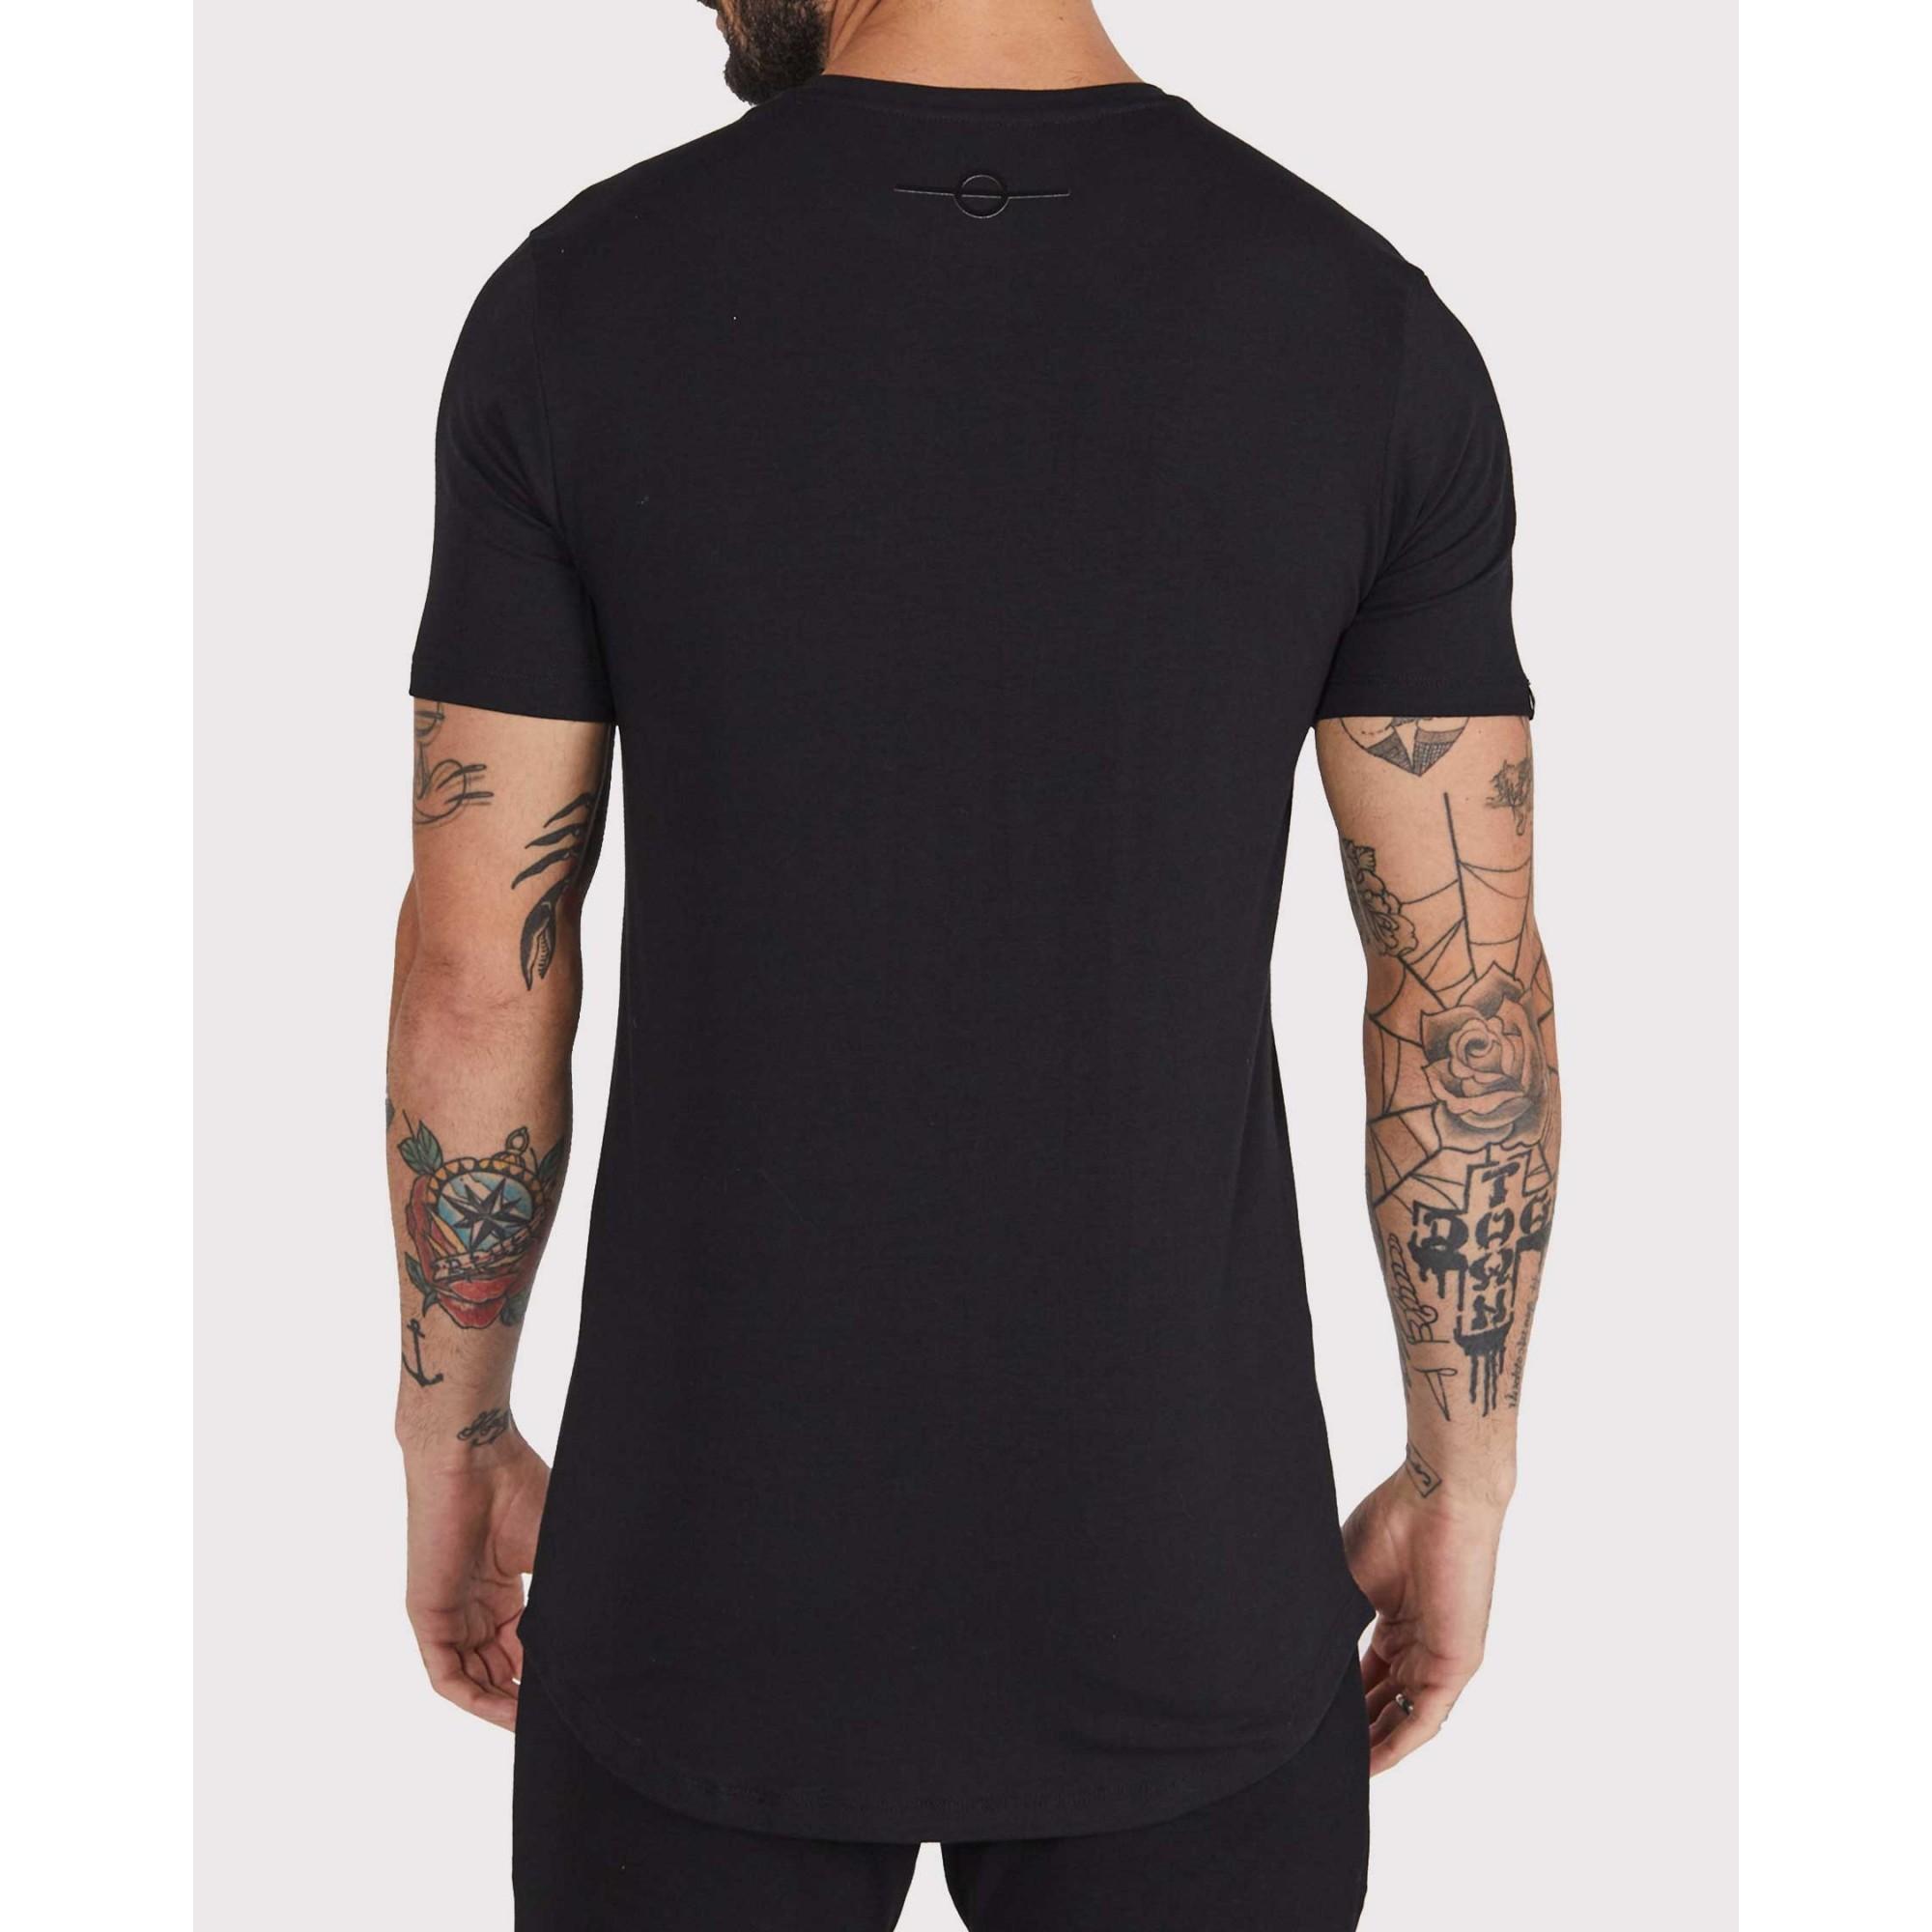 Camiseta Buh Clouds Black